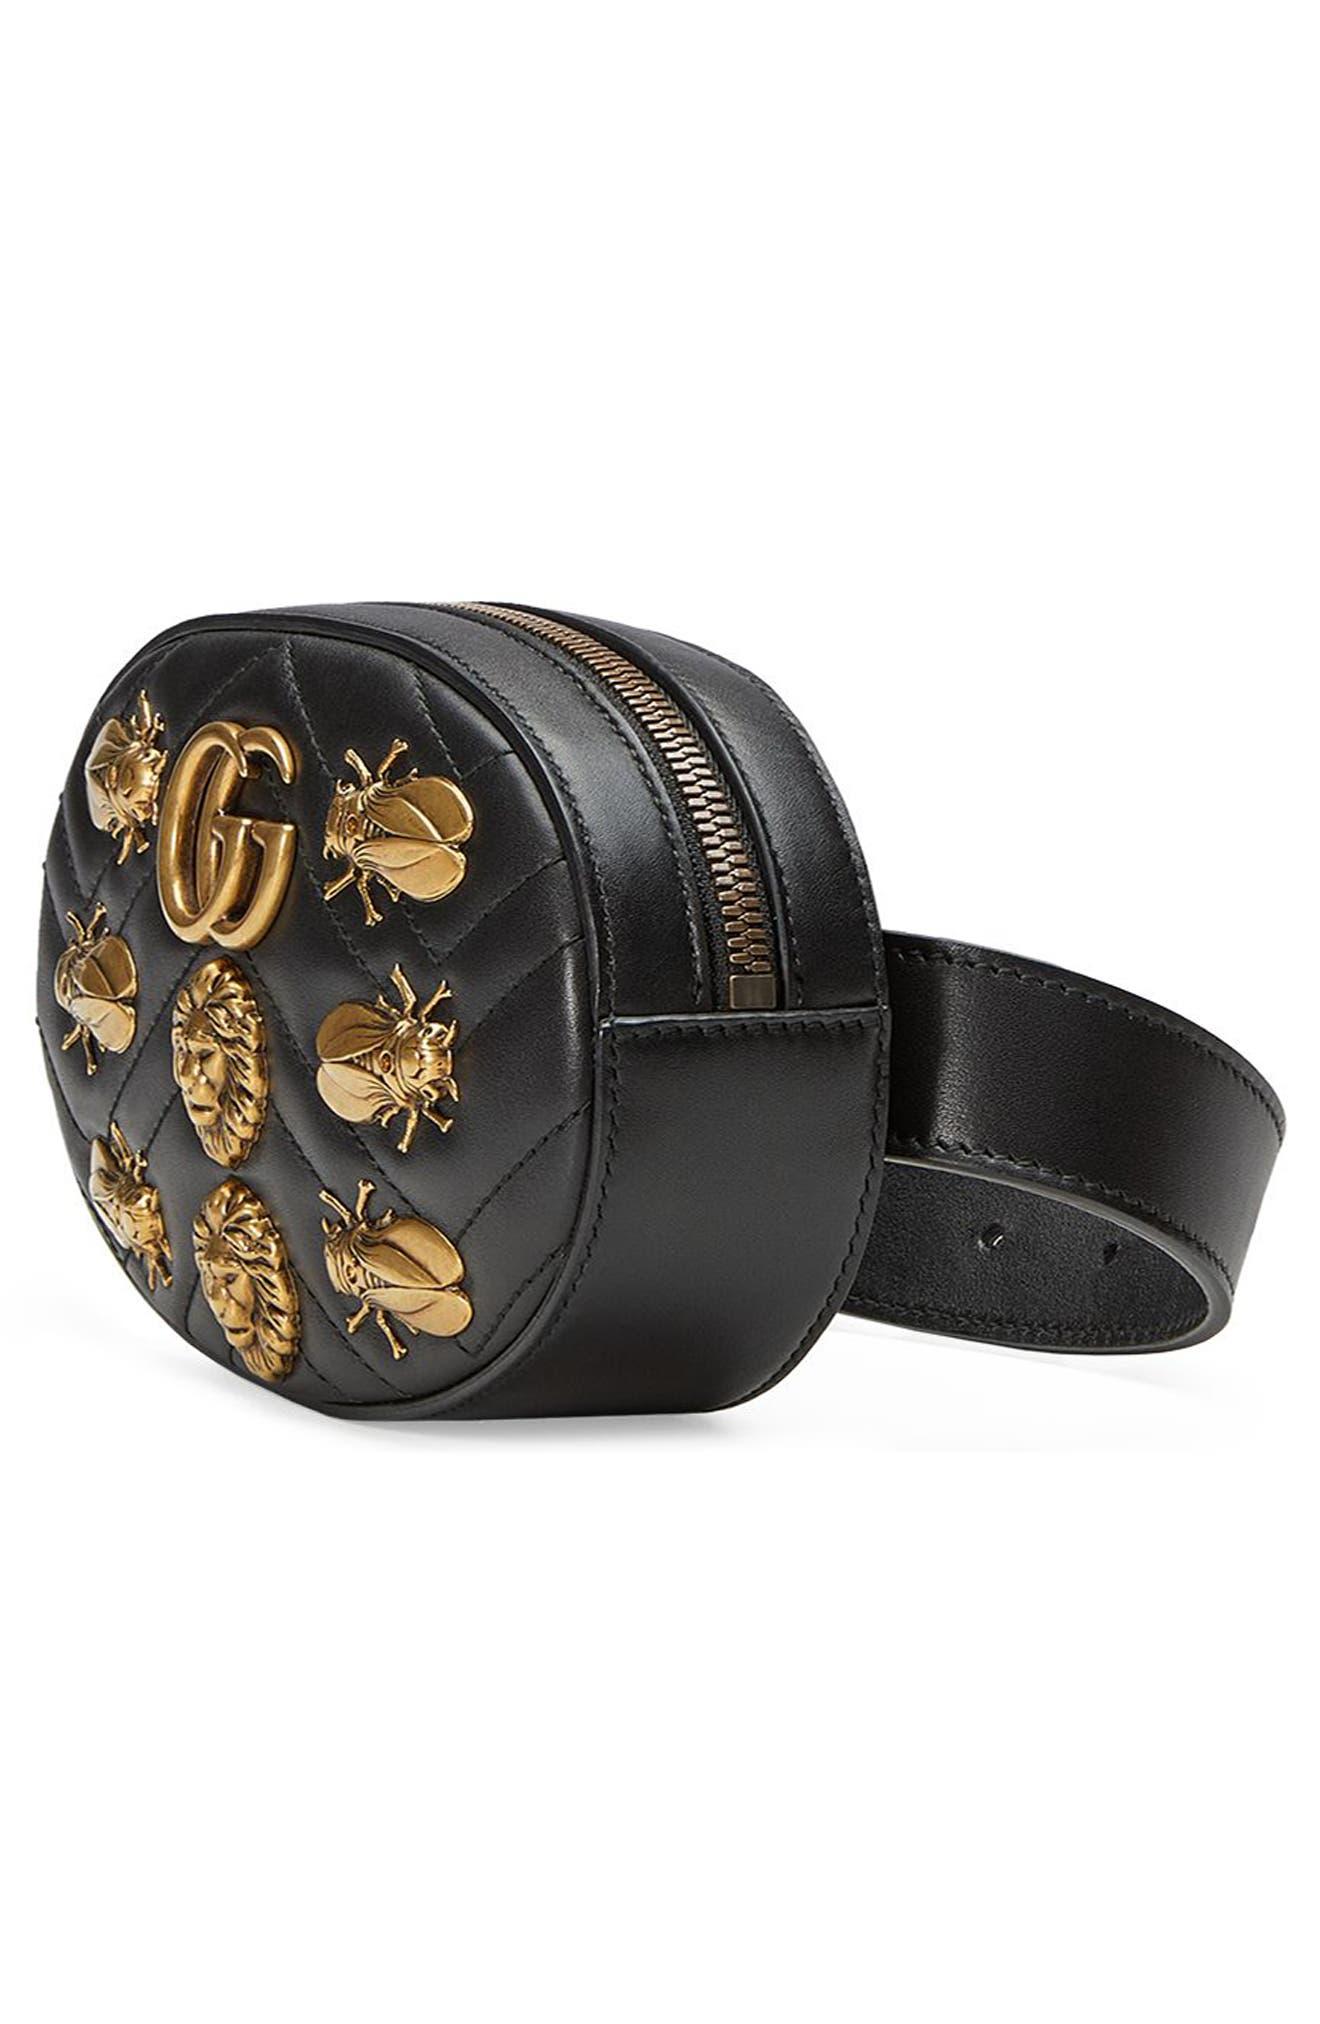 GG Marmont 2.0 Animal Stud Matelassé Leather Belt Bag,                             Alternate thumbnail 4, color,                             001